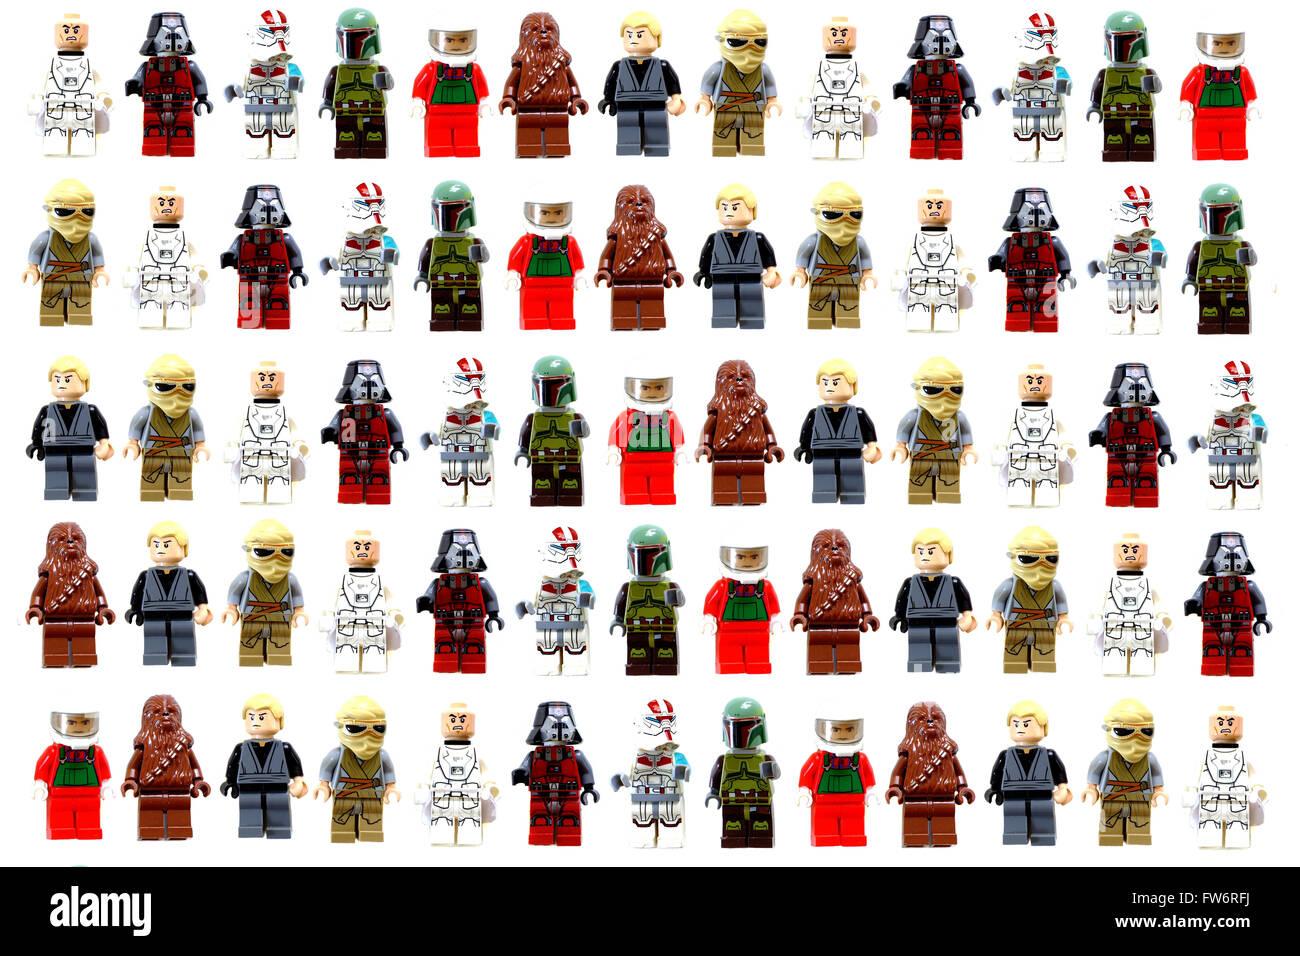 star wars lego stock photos star wars lego stock images. Black Bedroom Furniture Sets. Home Design Ideas